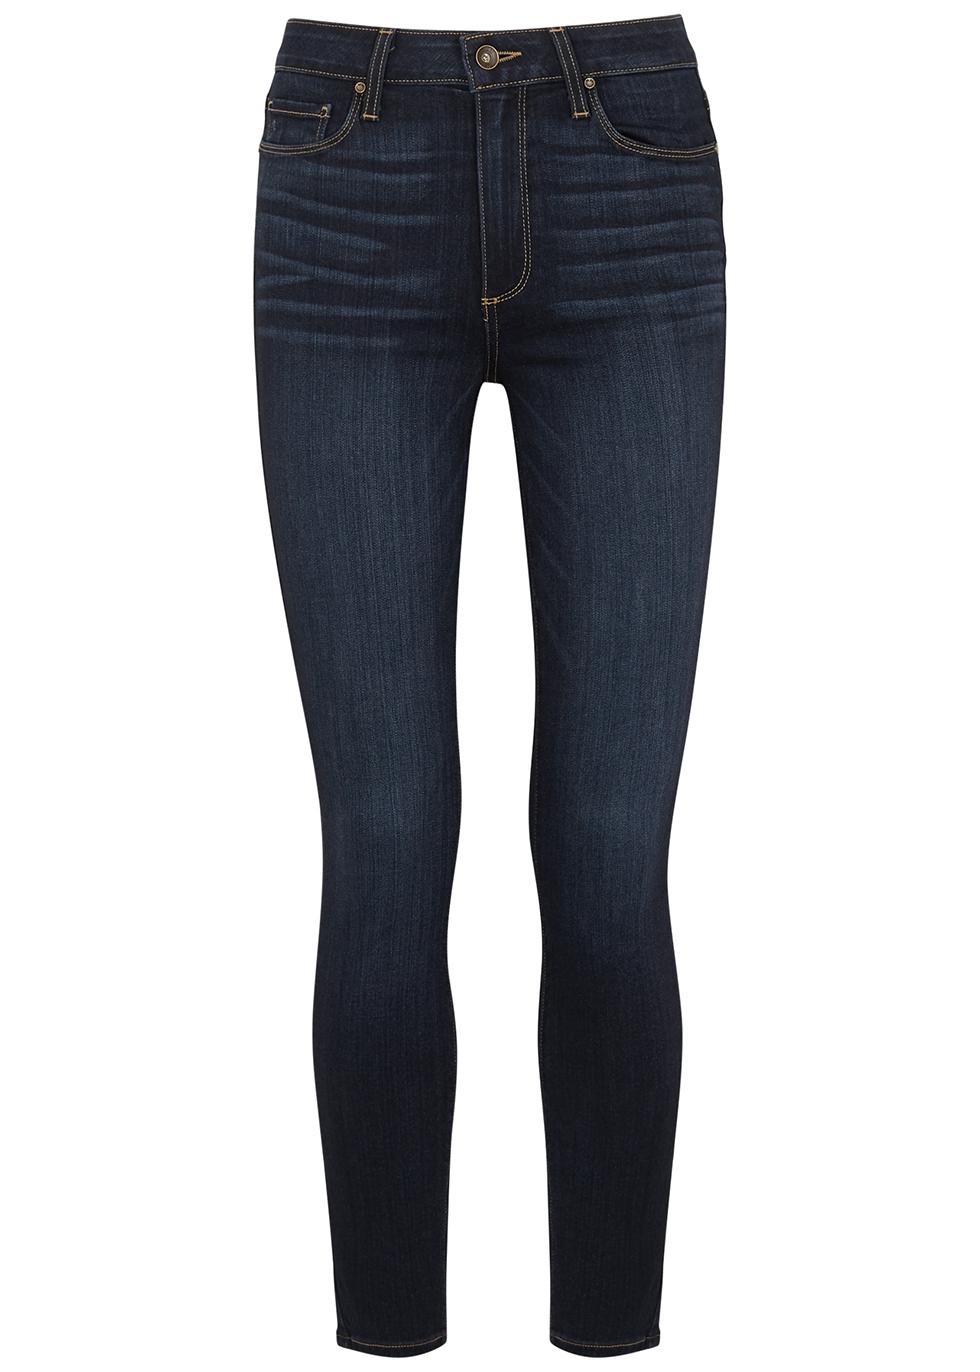 Hoxton Ankle indigo skinny jeans